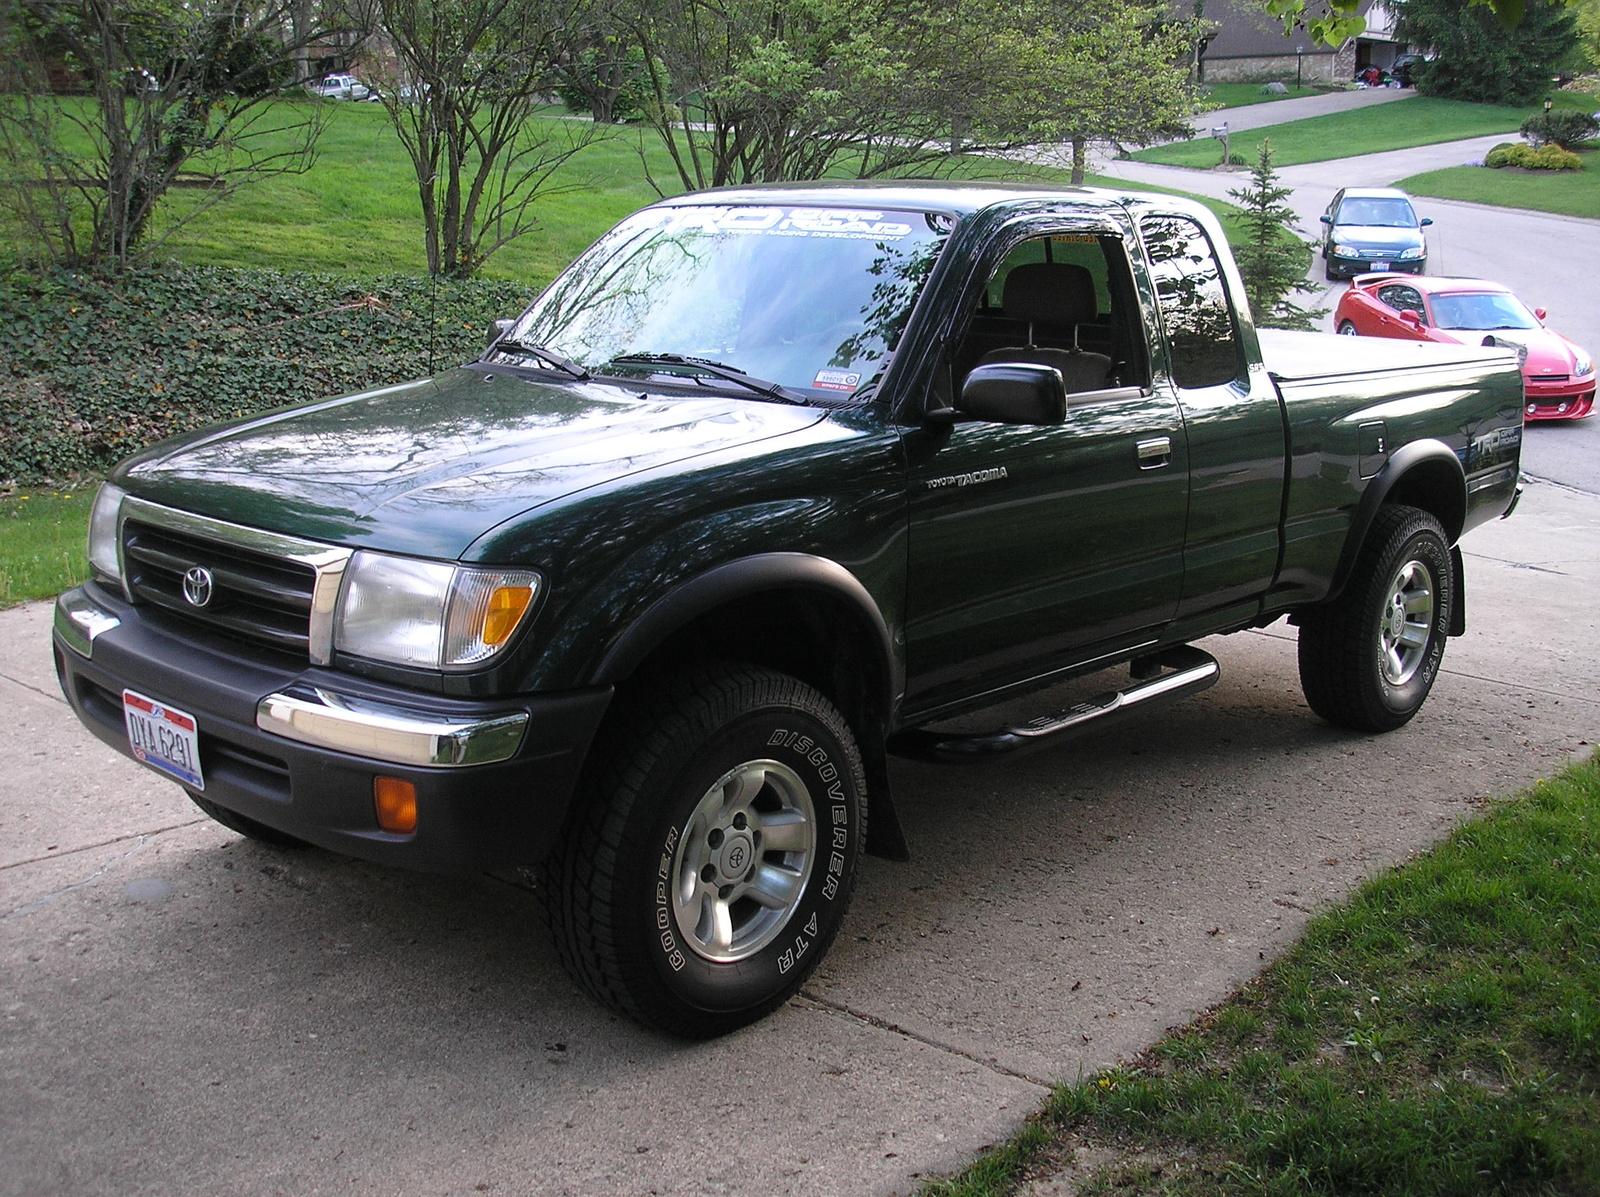 1999 Toyota Tacoma Image 8